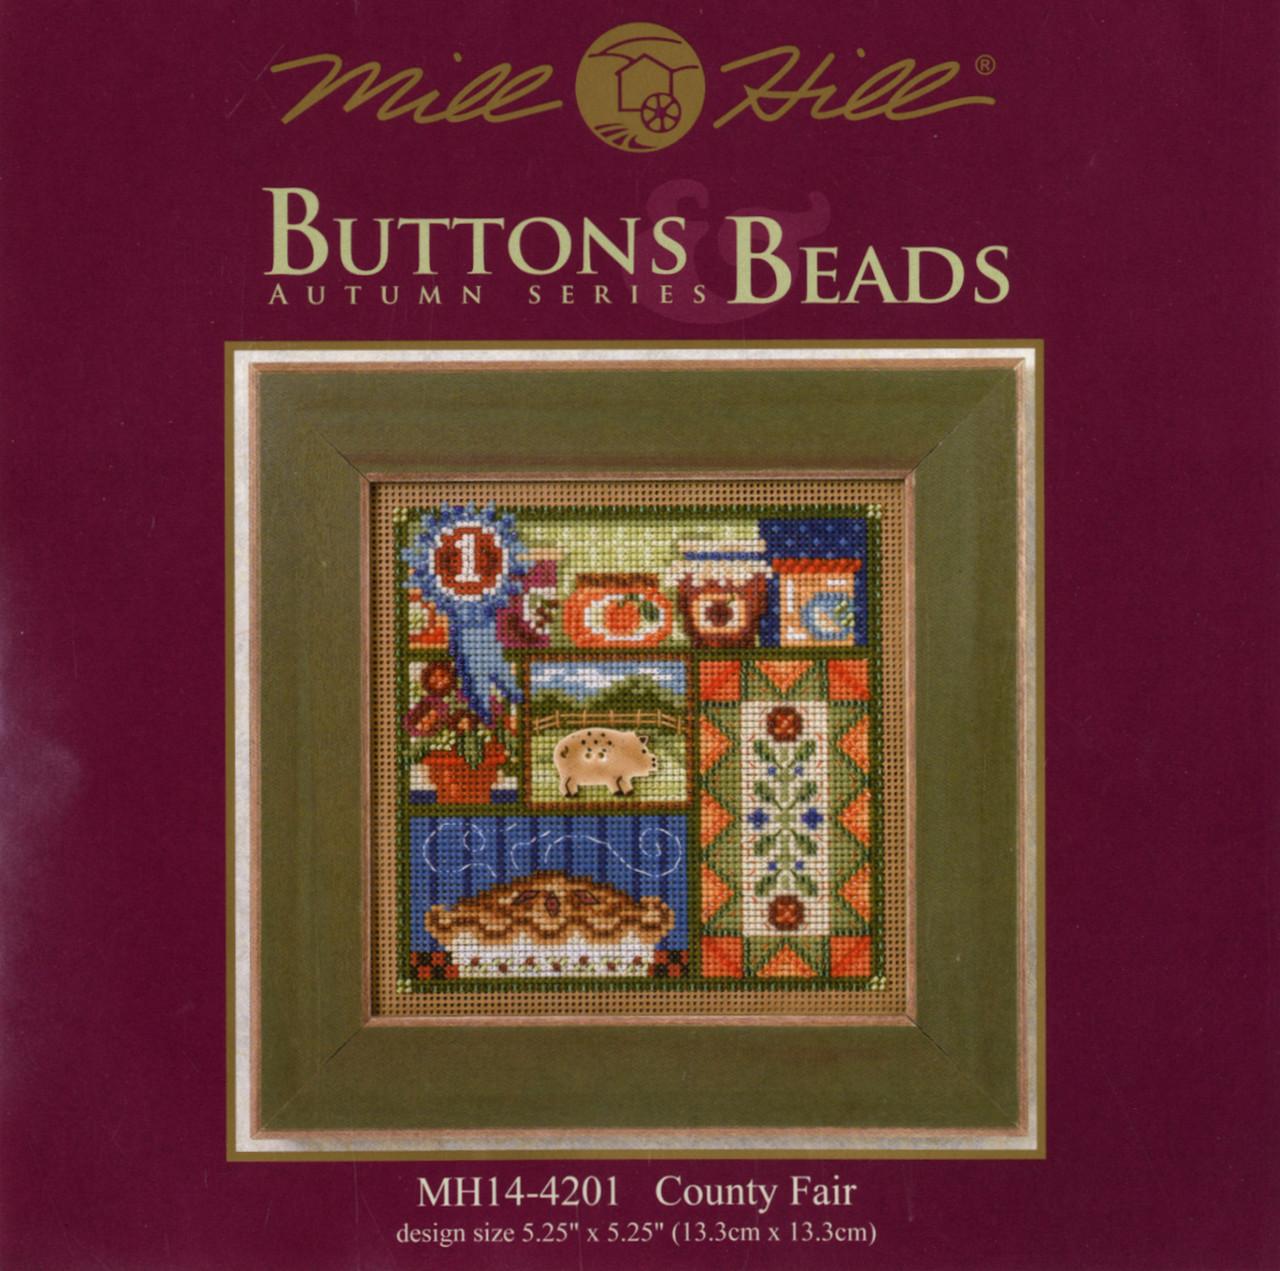 2014 Mill Hill Buttons & Beads Autumn Series  - County Fair